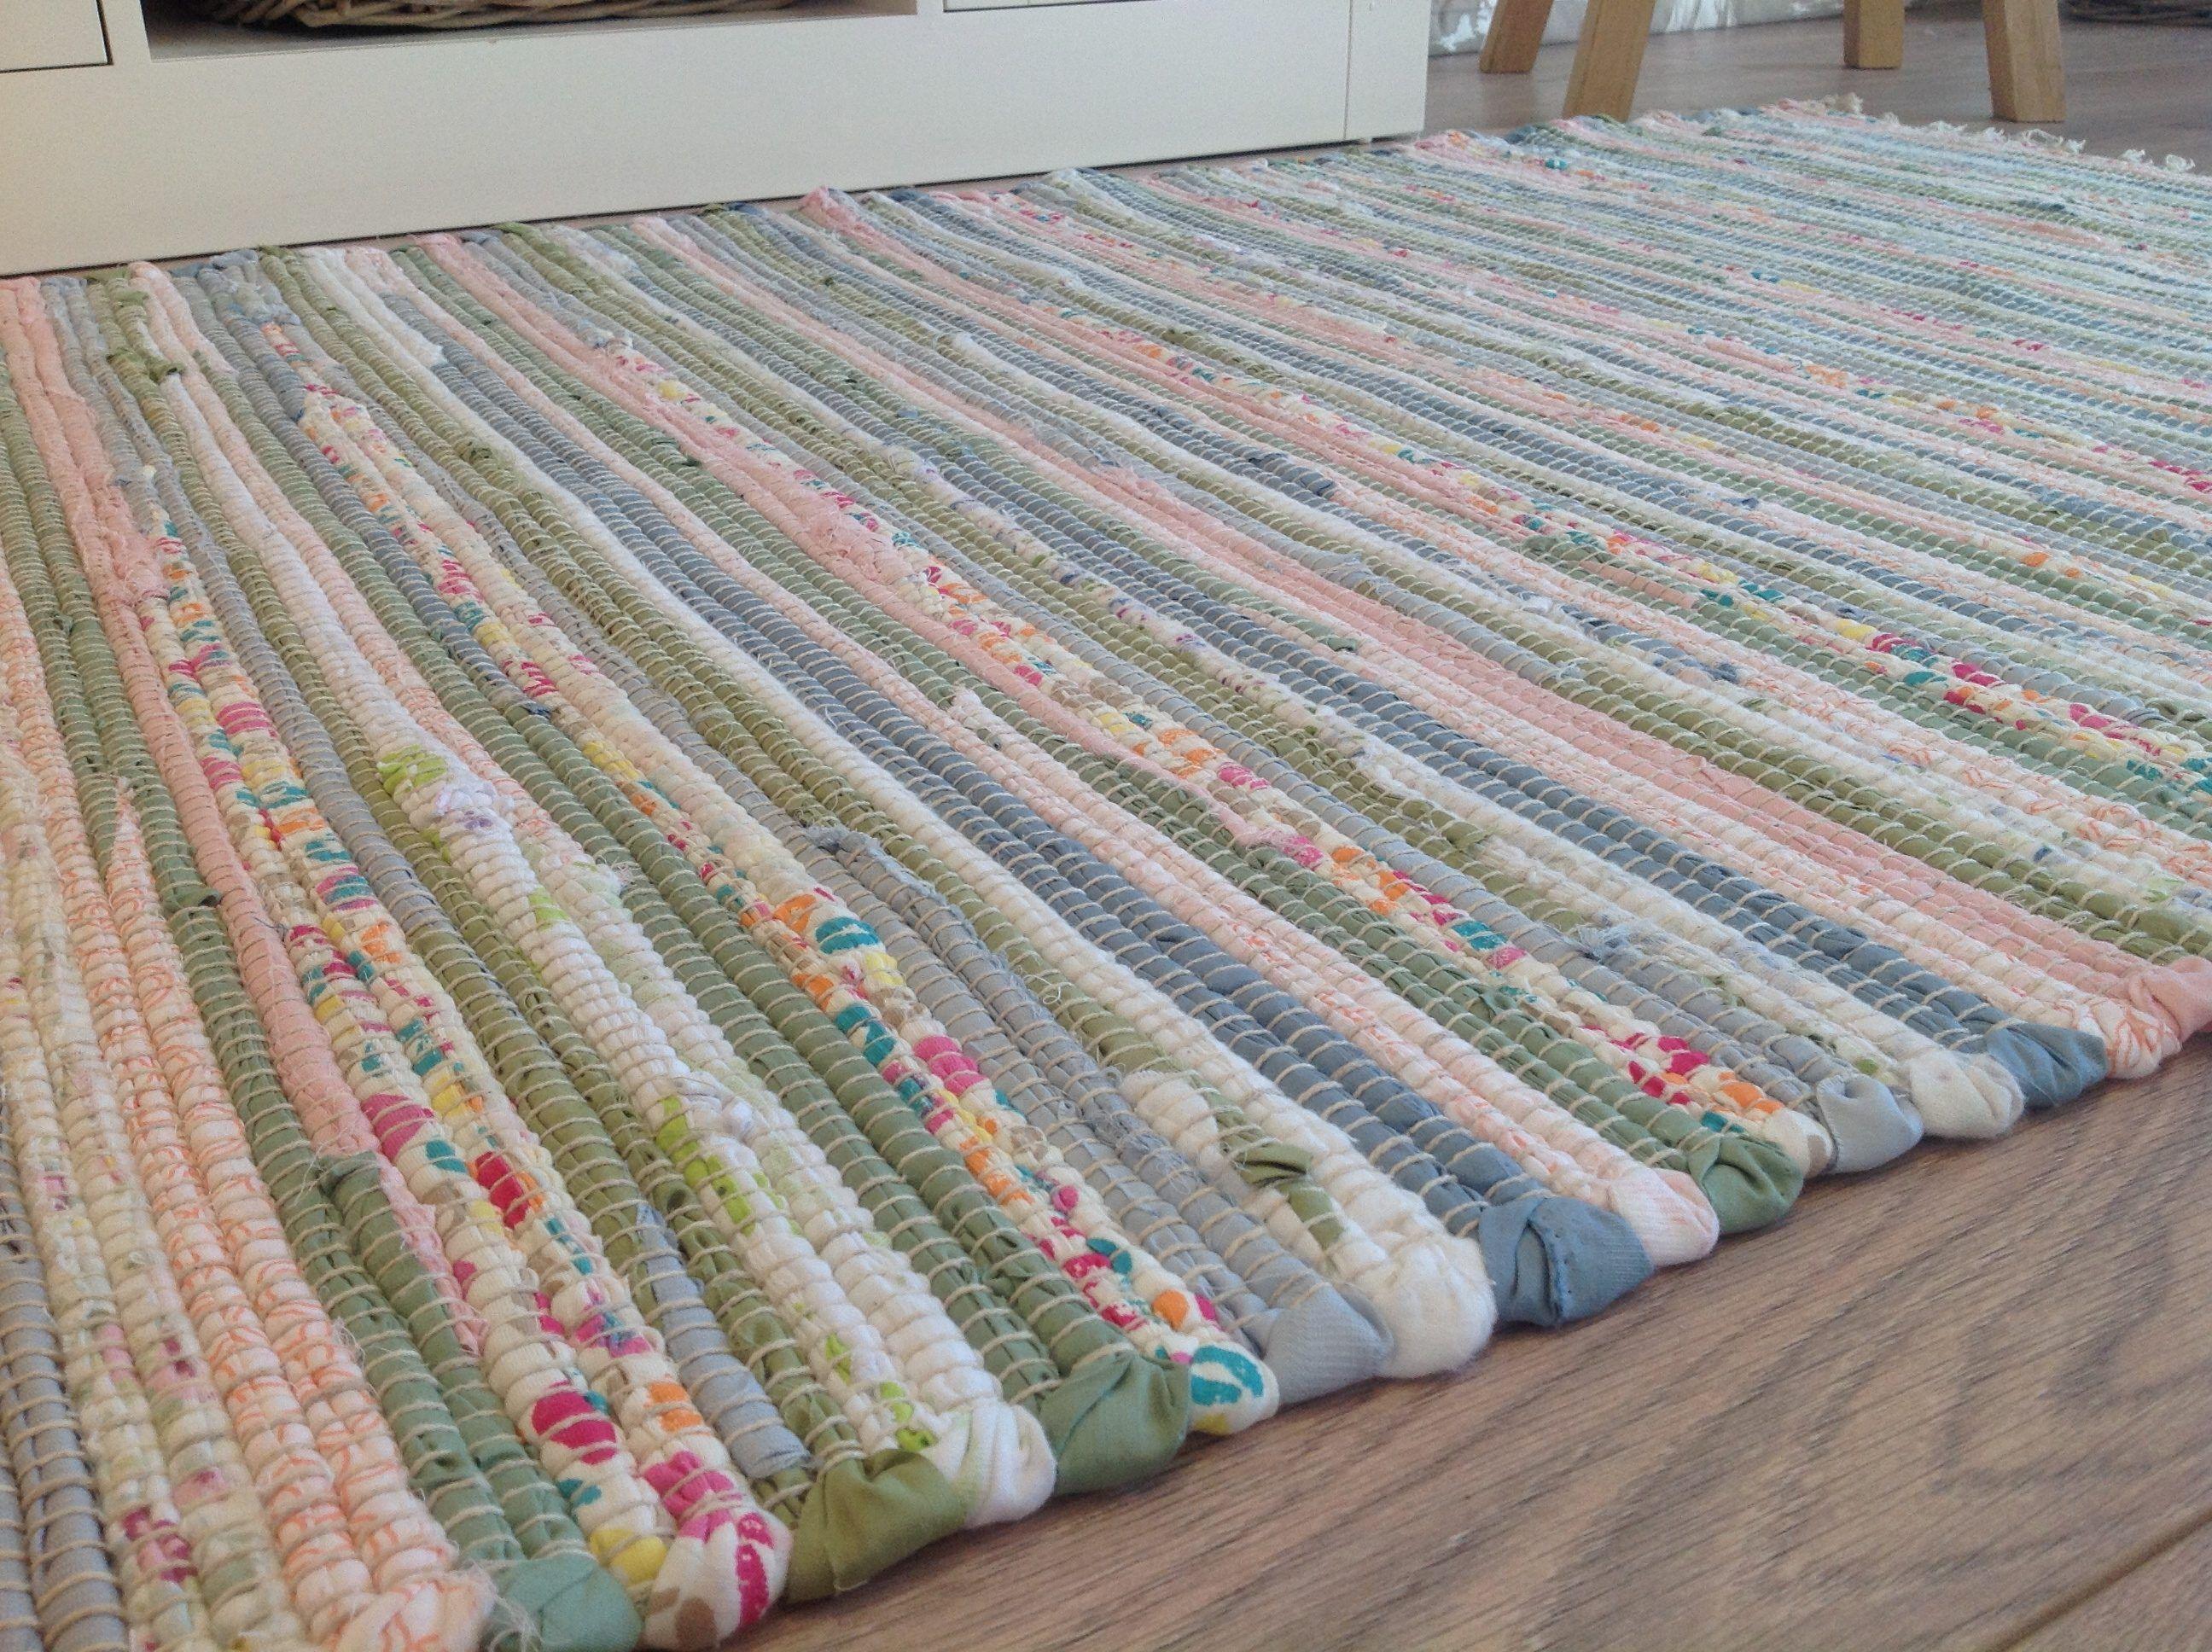 Cotton Rag Rugs Washable Eco Friendly